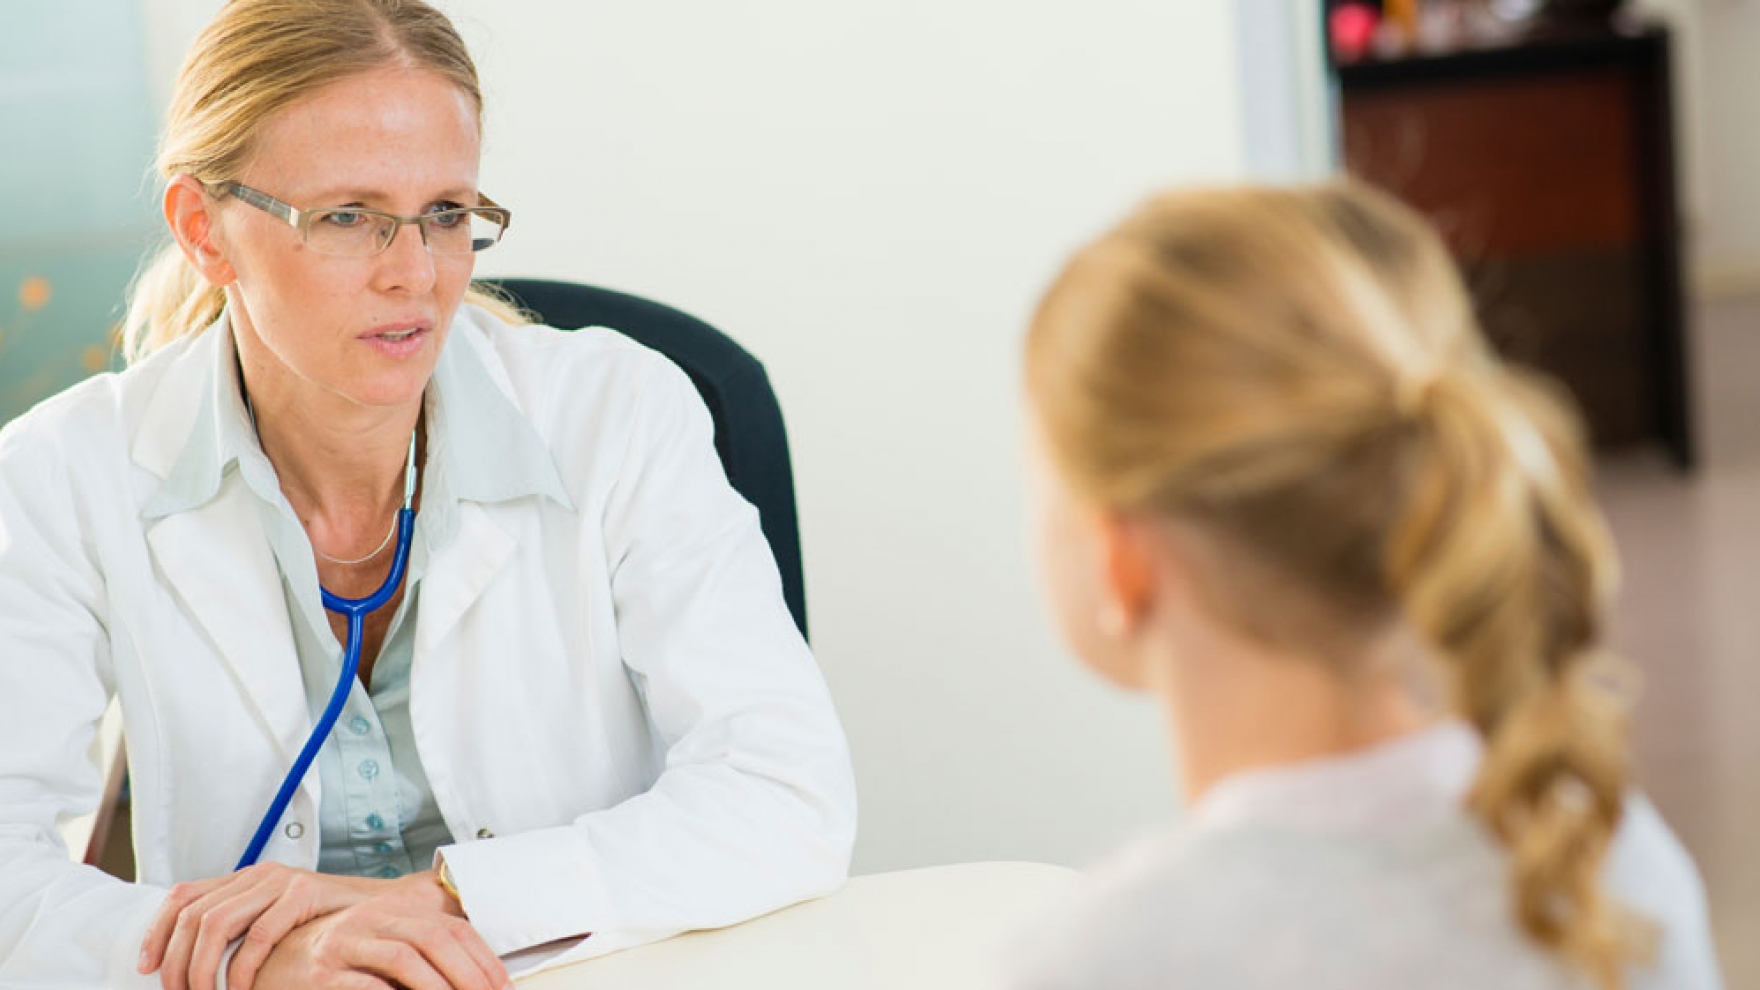 Ucsf neuro surgeon sex abuse